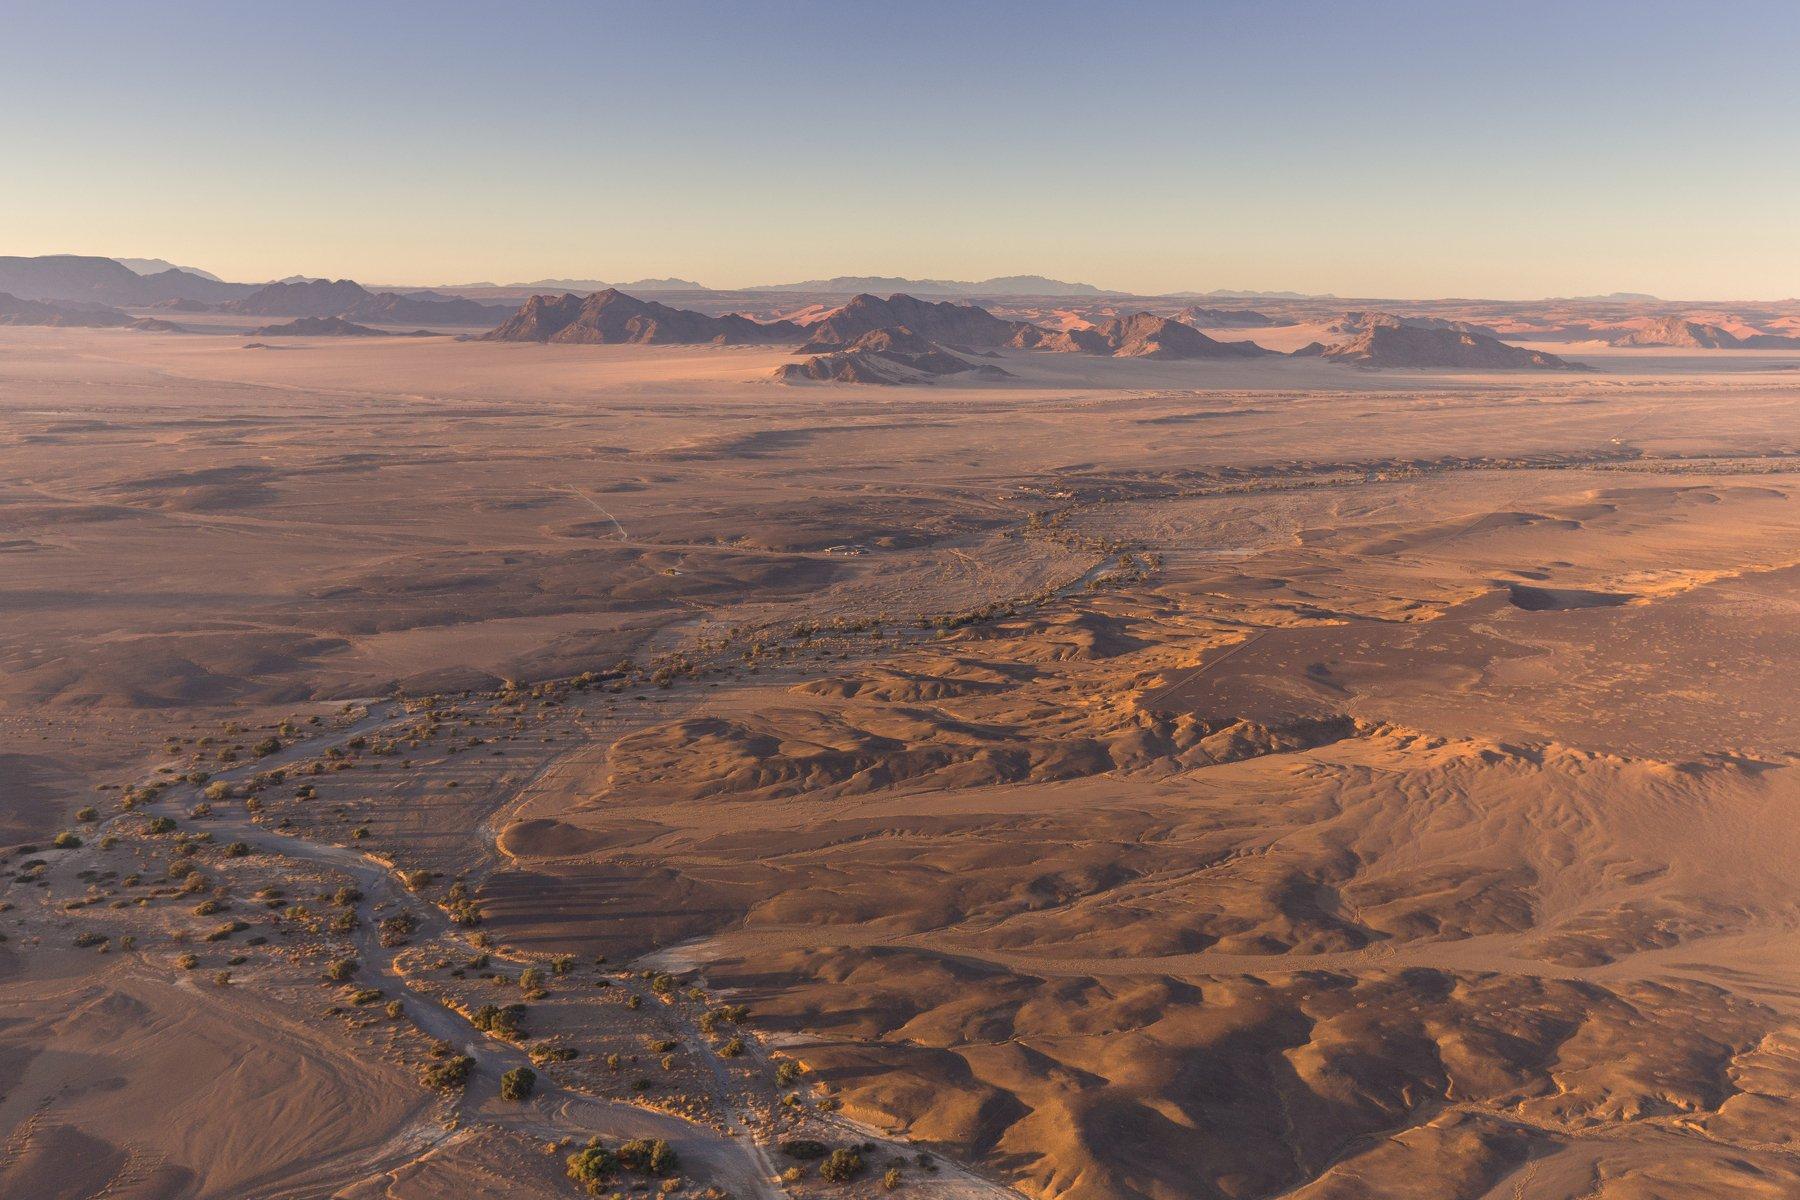 desert, namibia, namib, sand, dunes, aerial, landscape, view, africa, dune, orange, nature, background, blue, texture, namibian, light, structure, travel, african, shadow, surreal, park, national, Гайдабуров Сергей